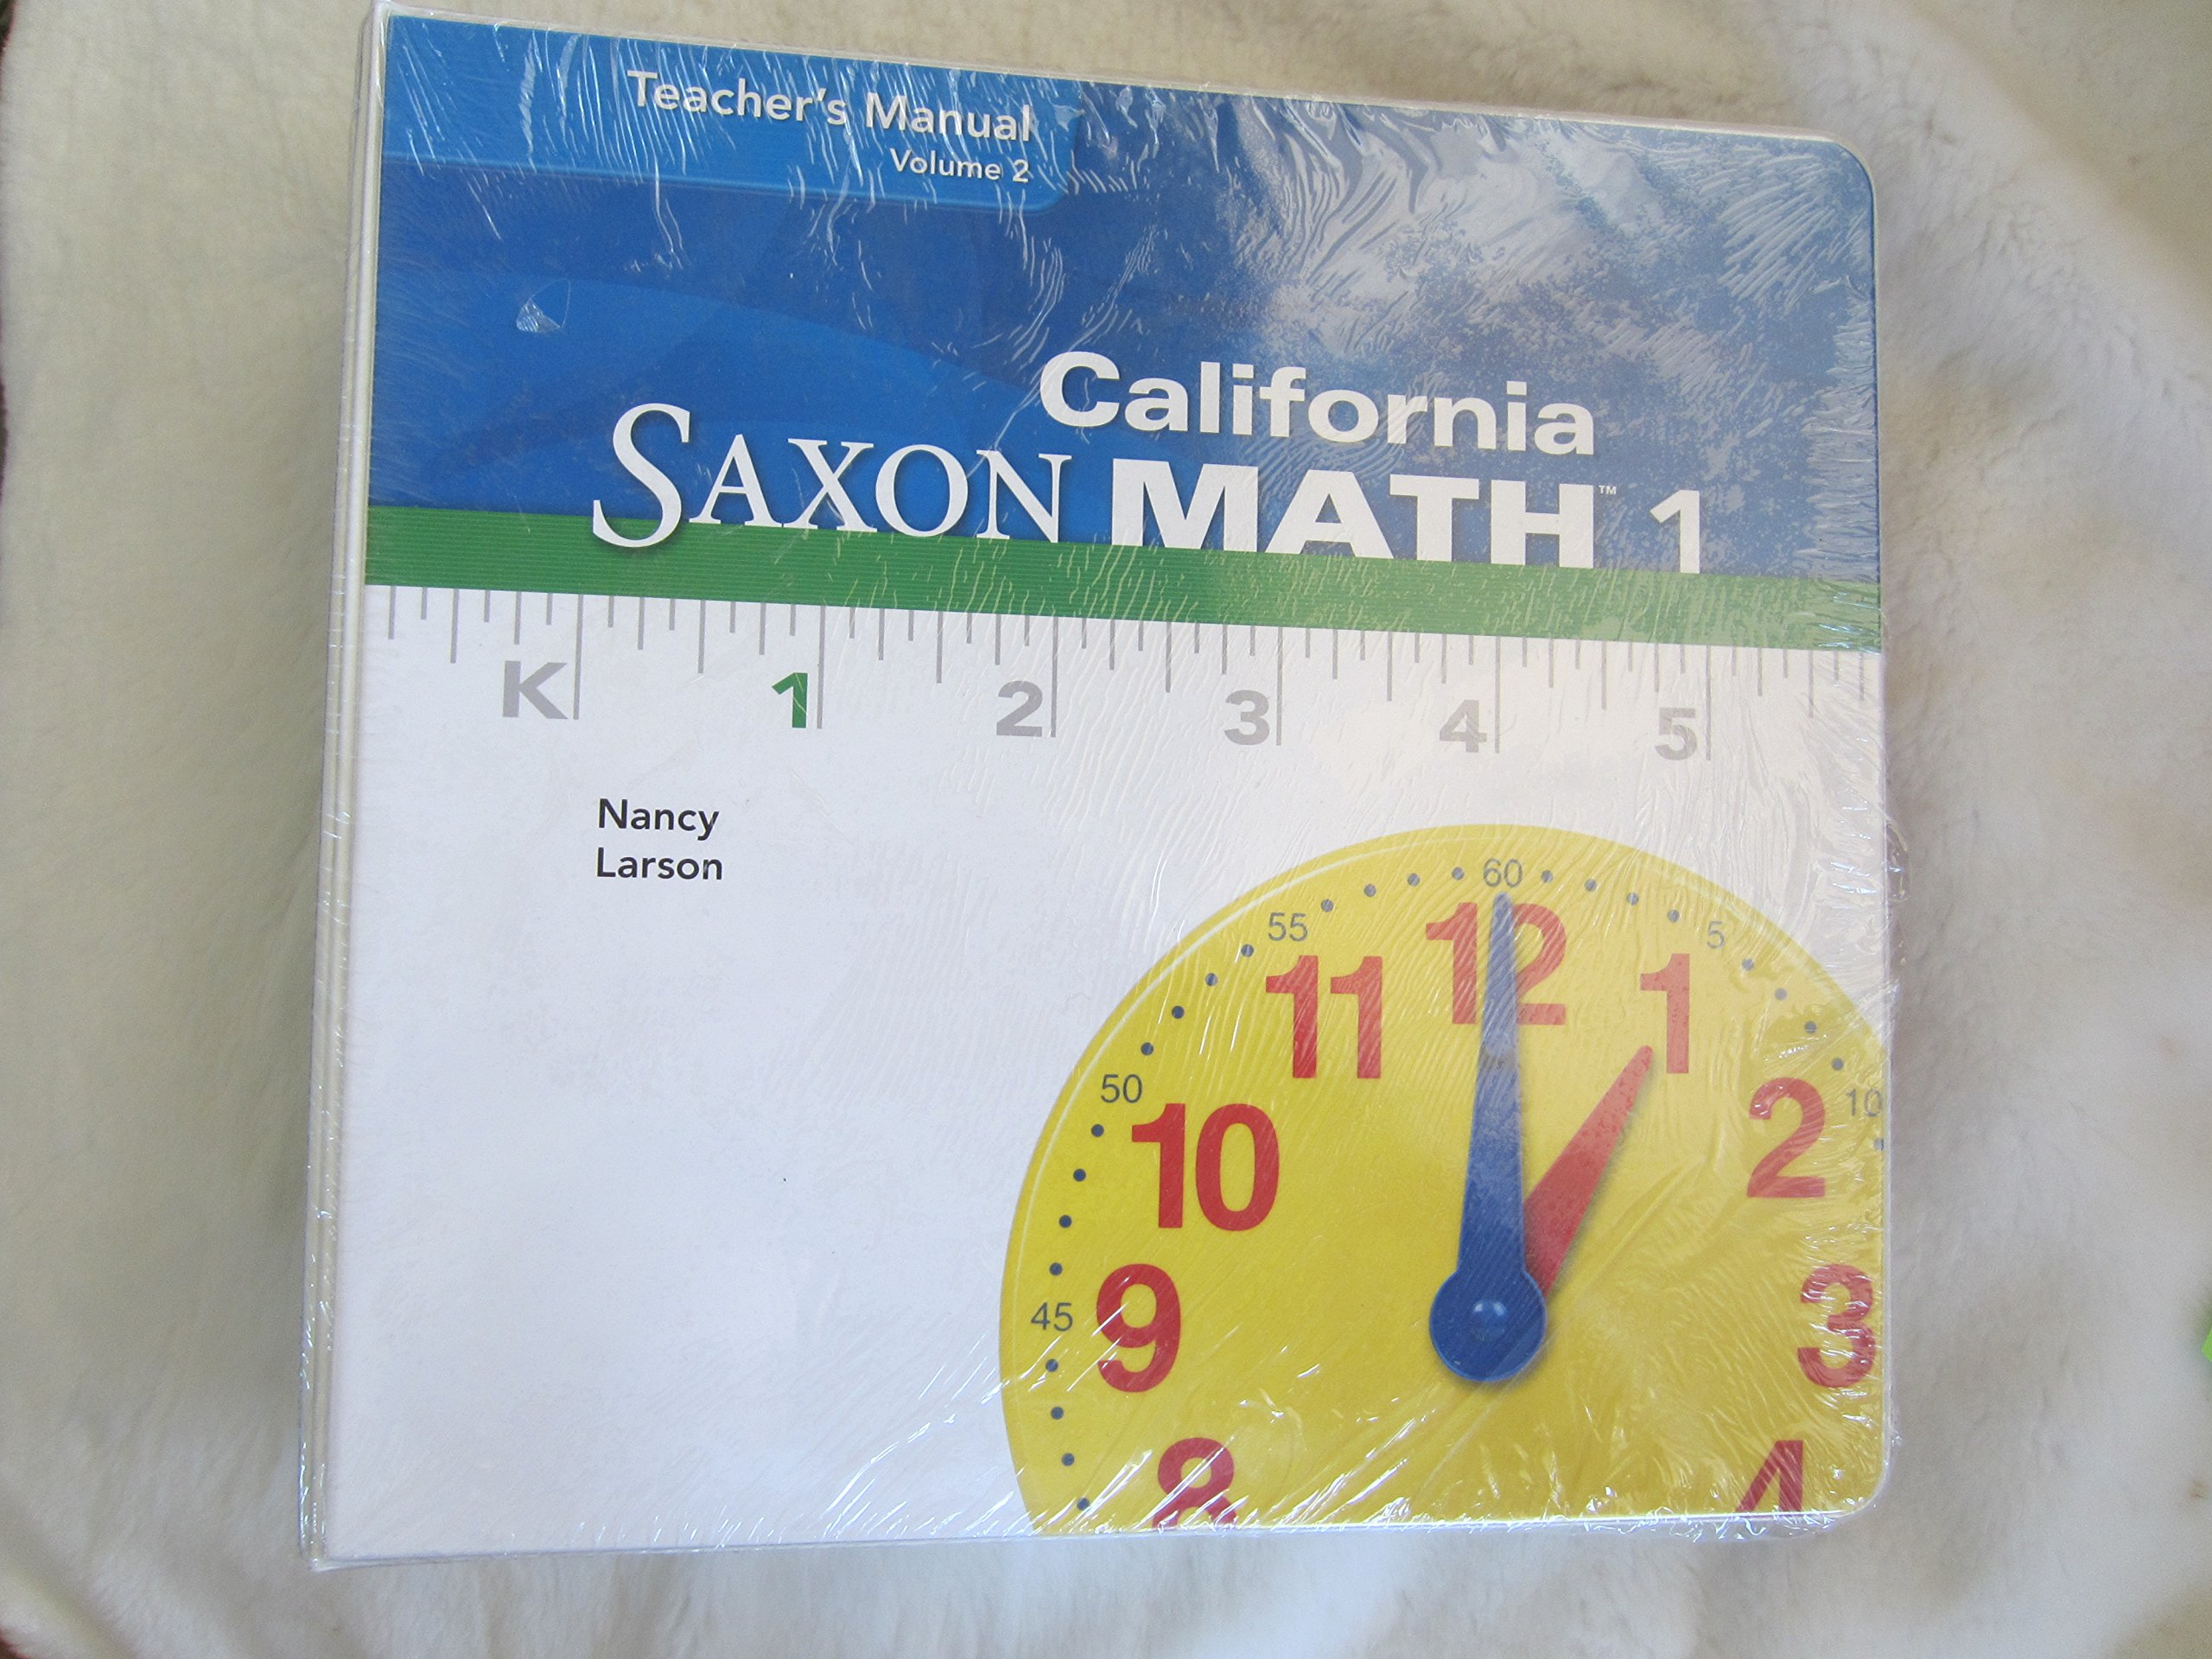 California Saxon Math ! Teacher's Manual Volume 2: Nancy Larson